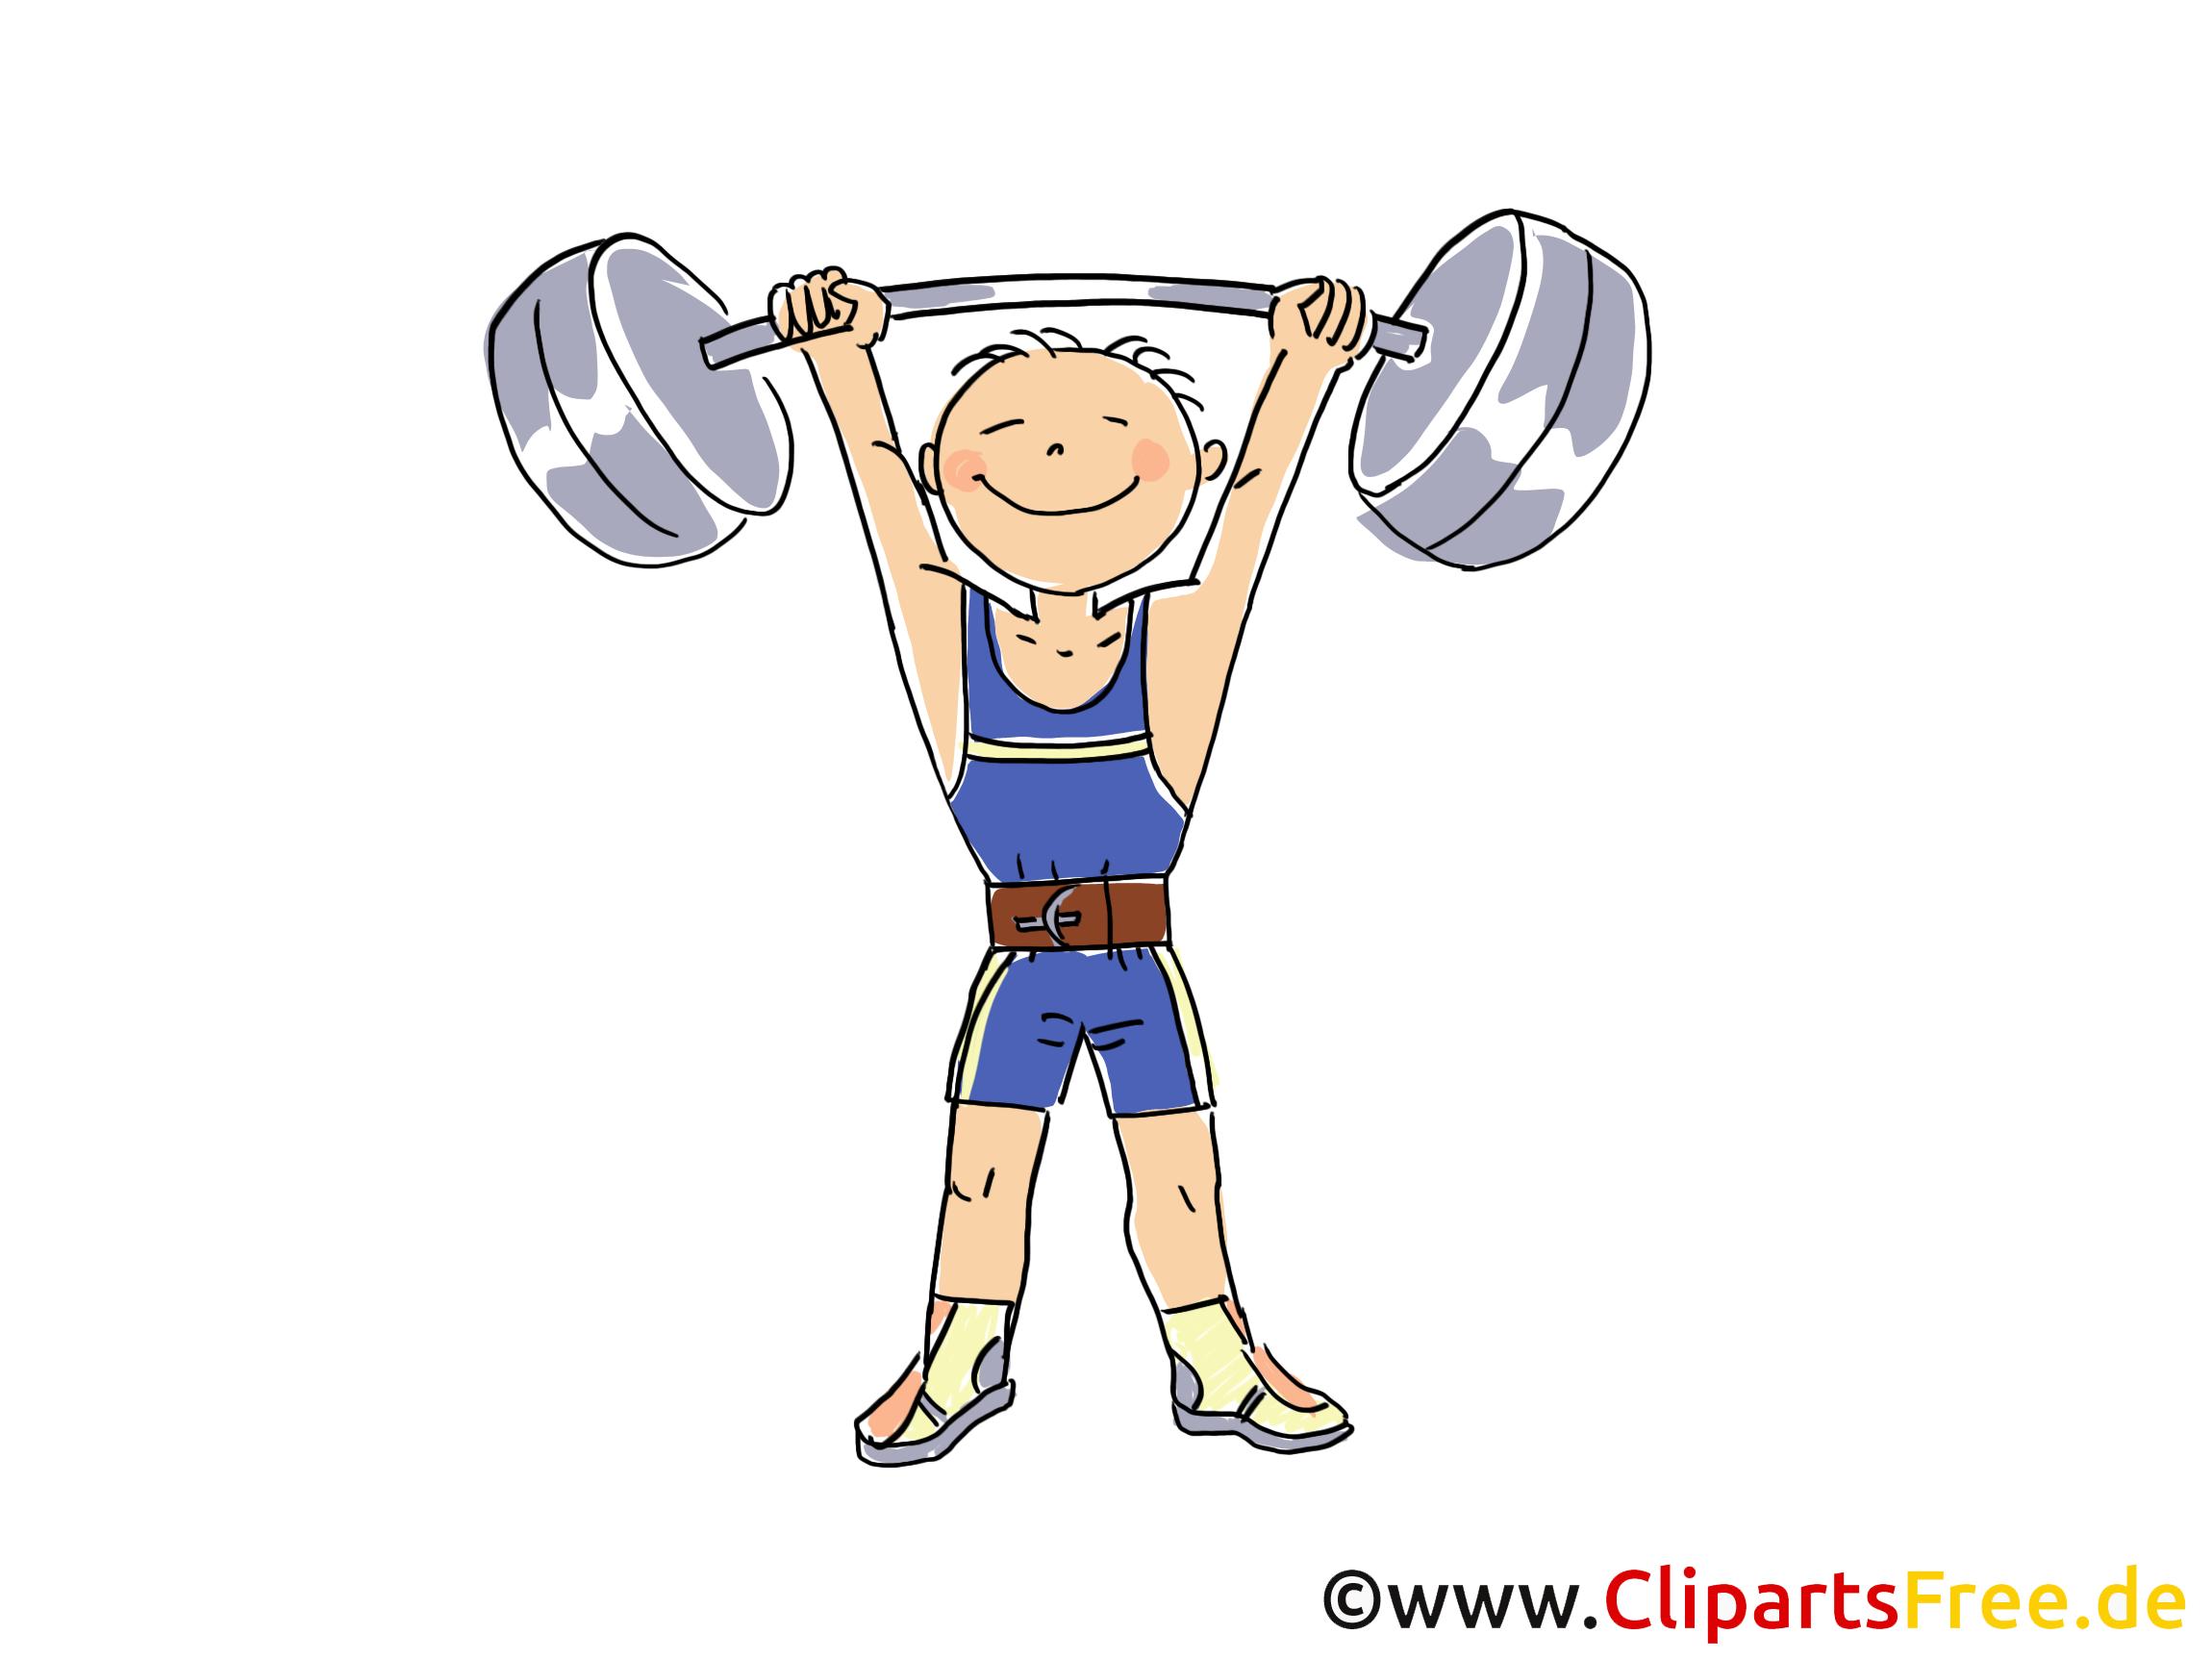 gewichtheben bild  sport cliparts  comic  cartoon  image gratis training clip art pictures training clipart png